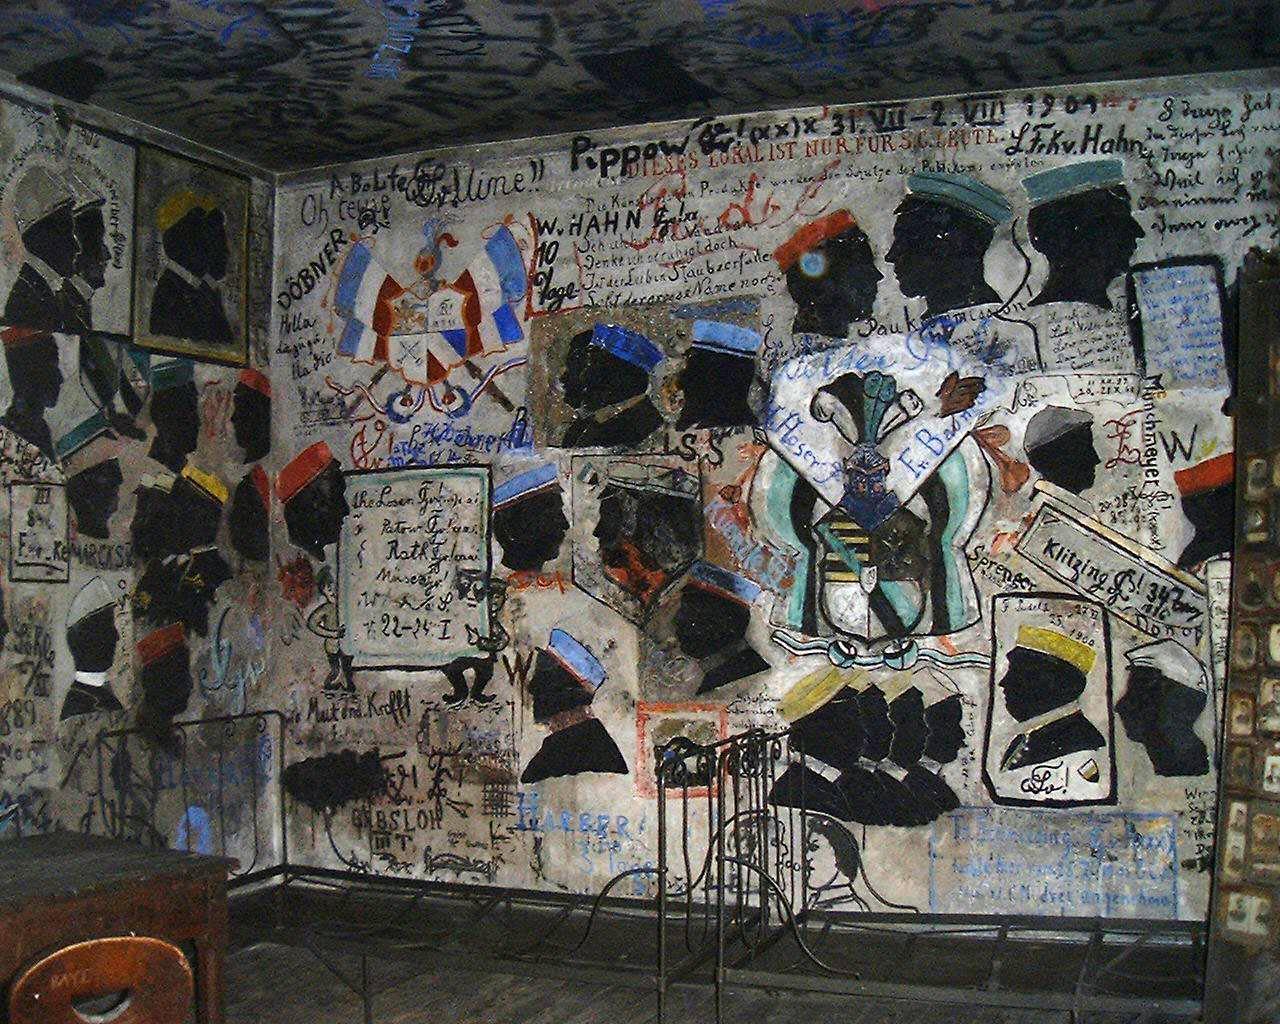 Student Graffiti in the Studentekarzer -photo by Wikipedia